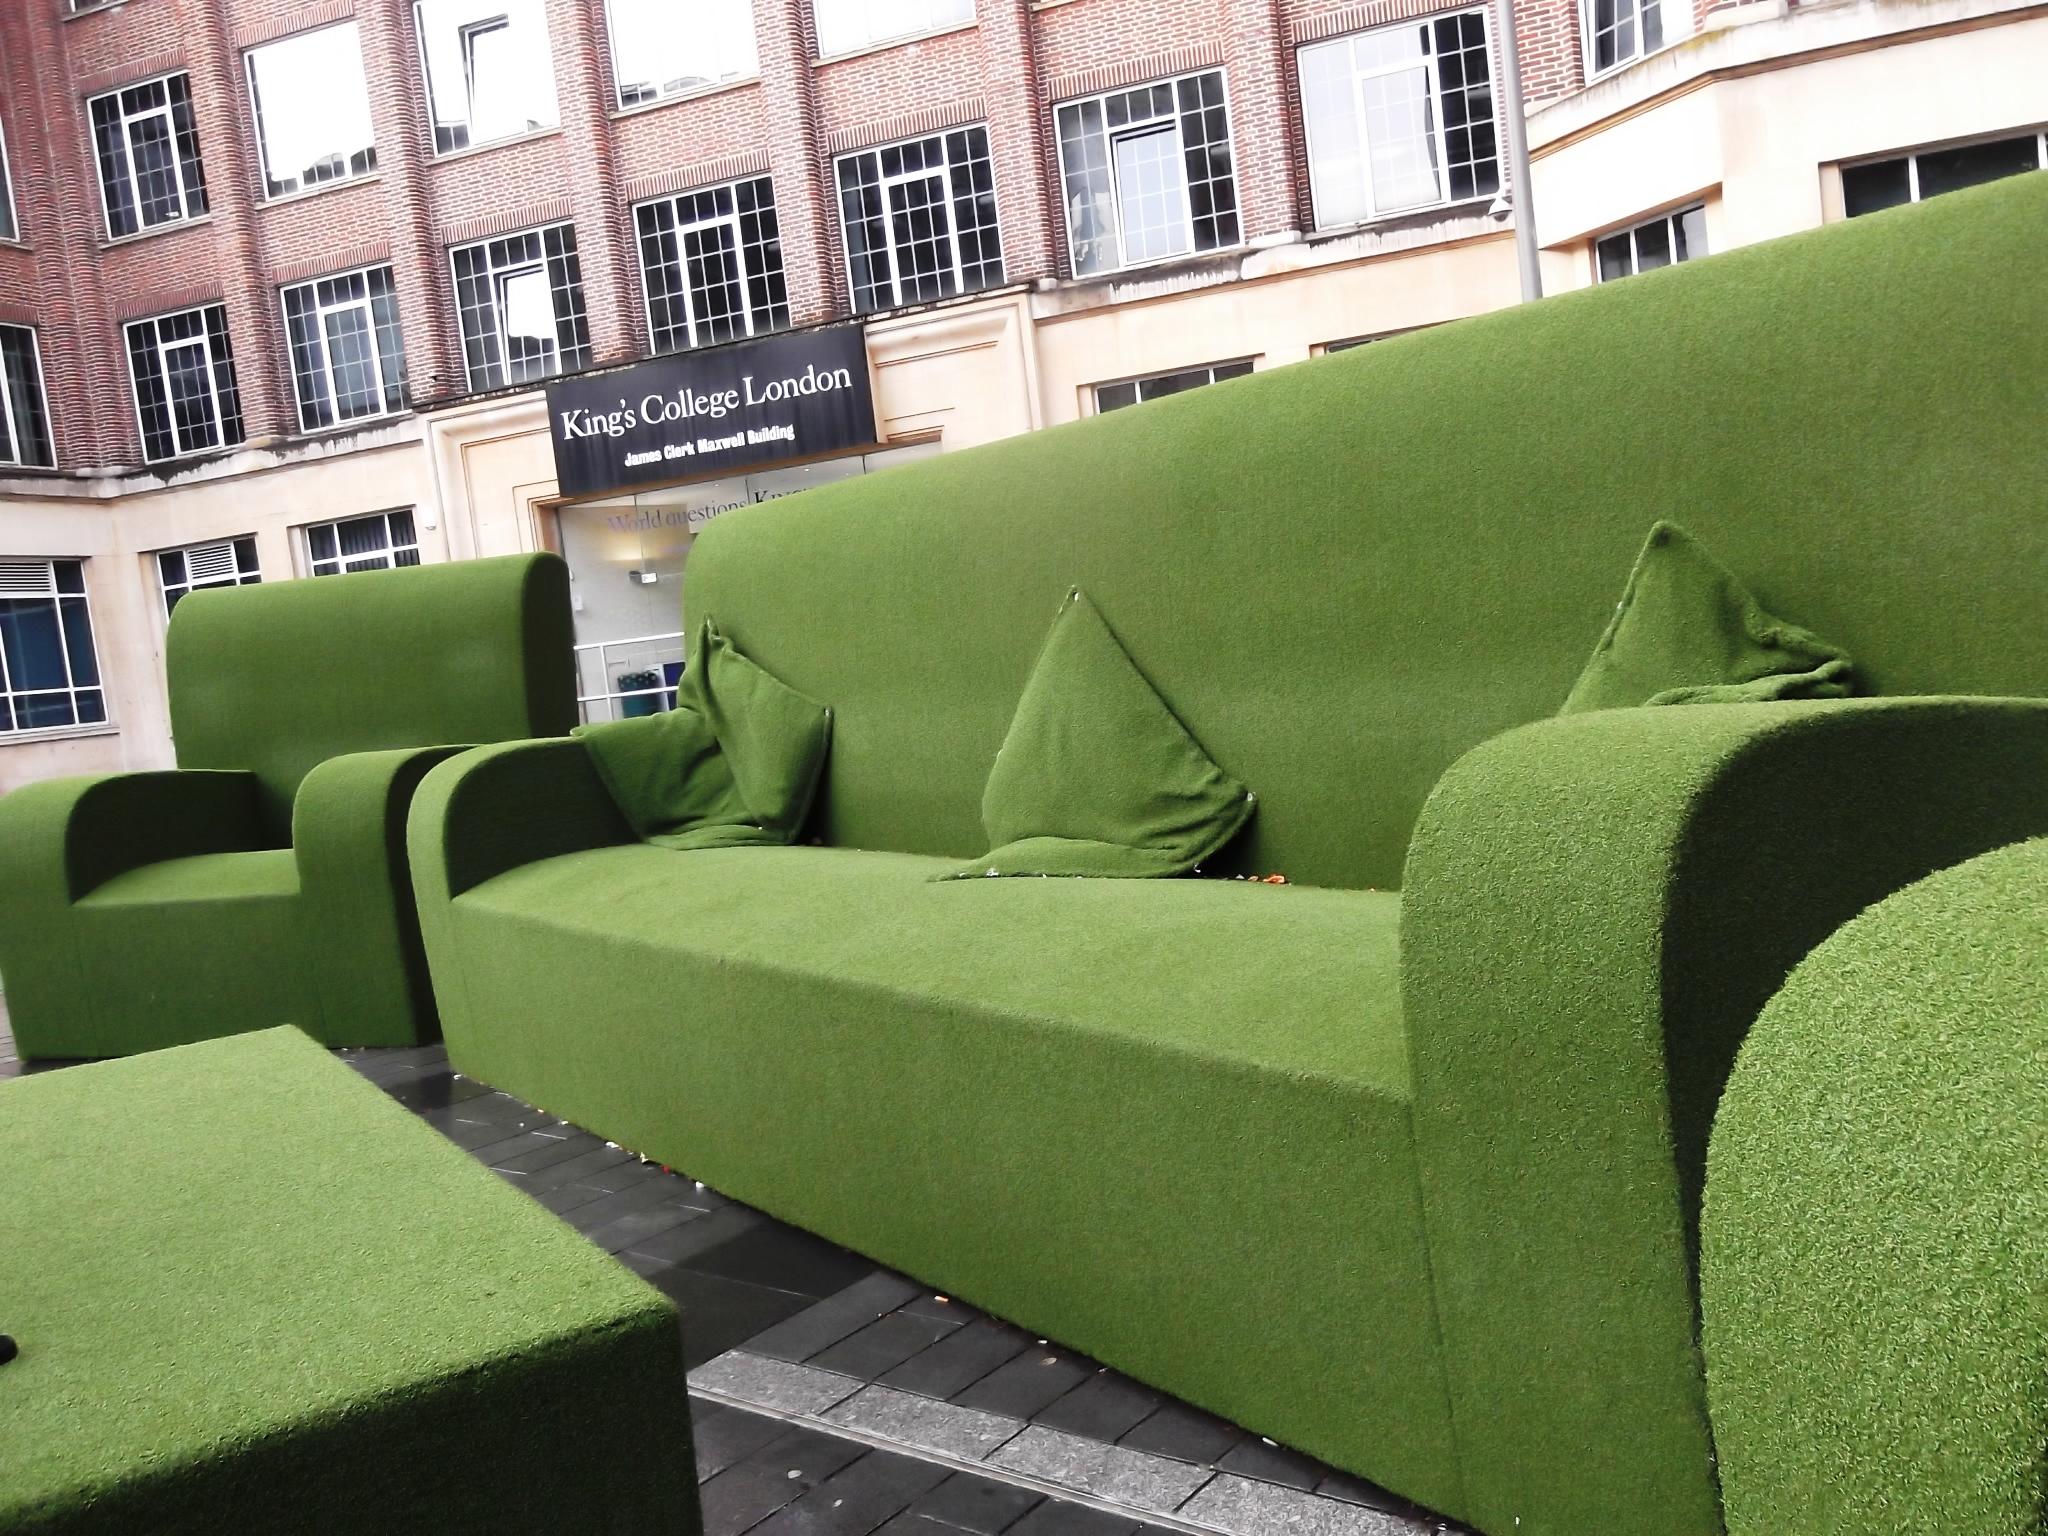 File Grass Chair London 001 JPG Wikimedia mons